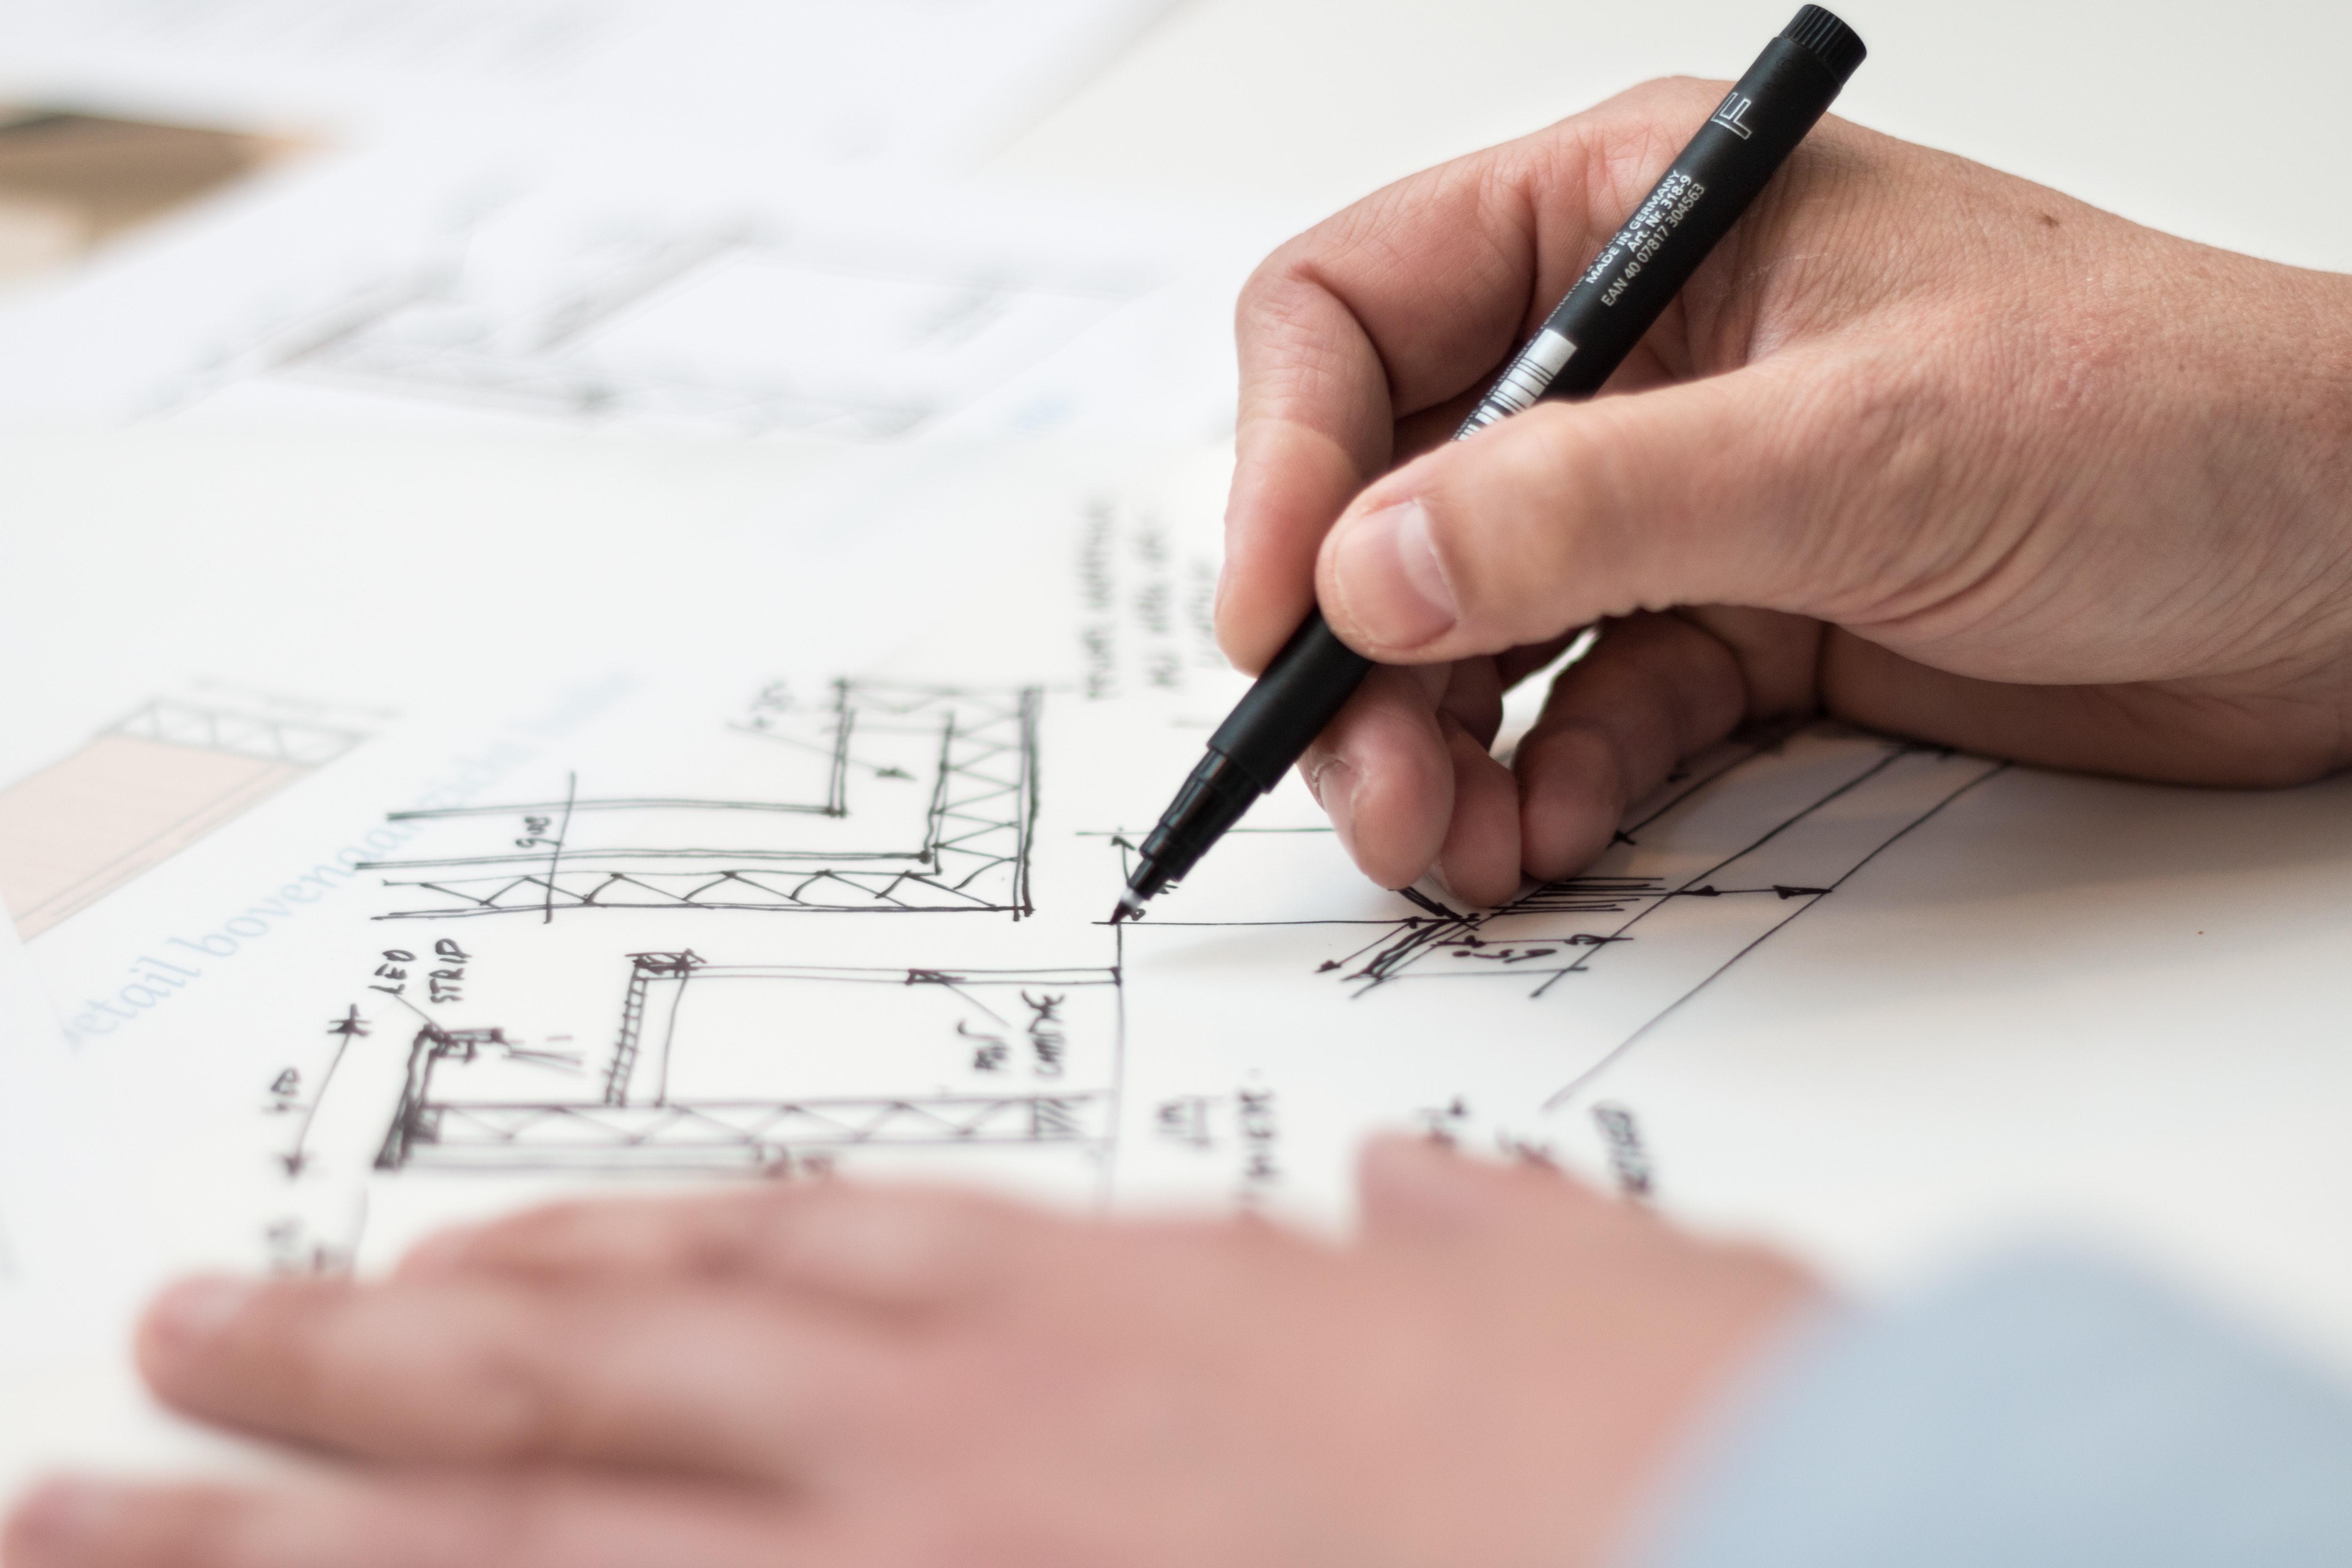 man working on blueprint